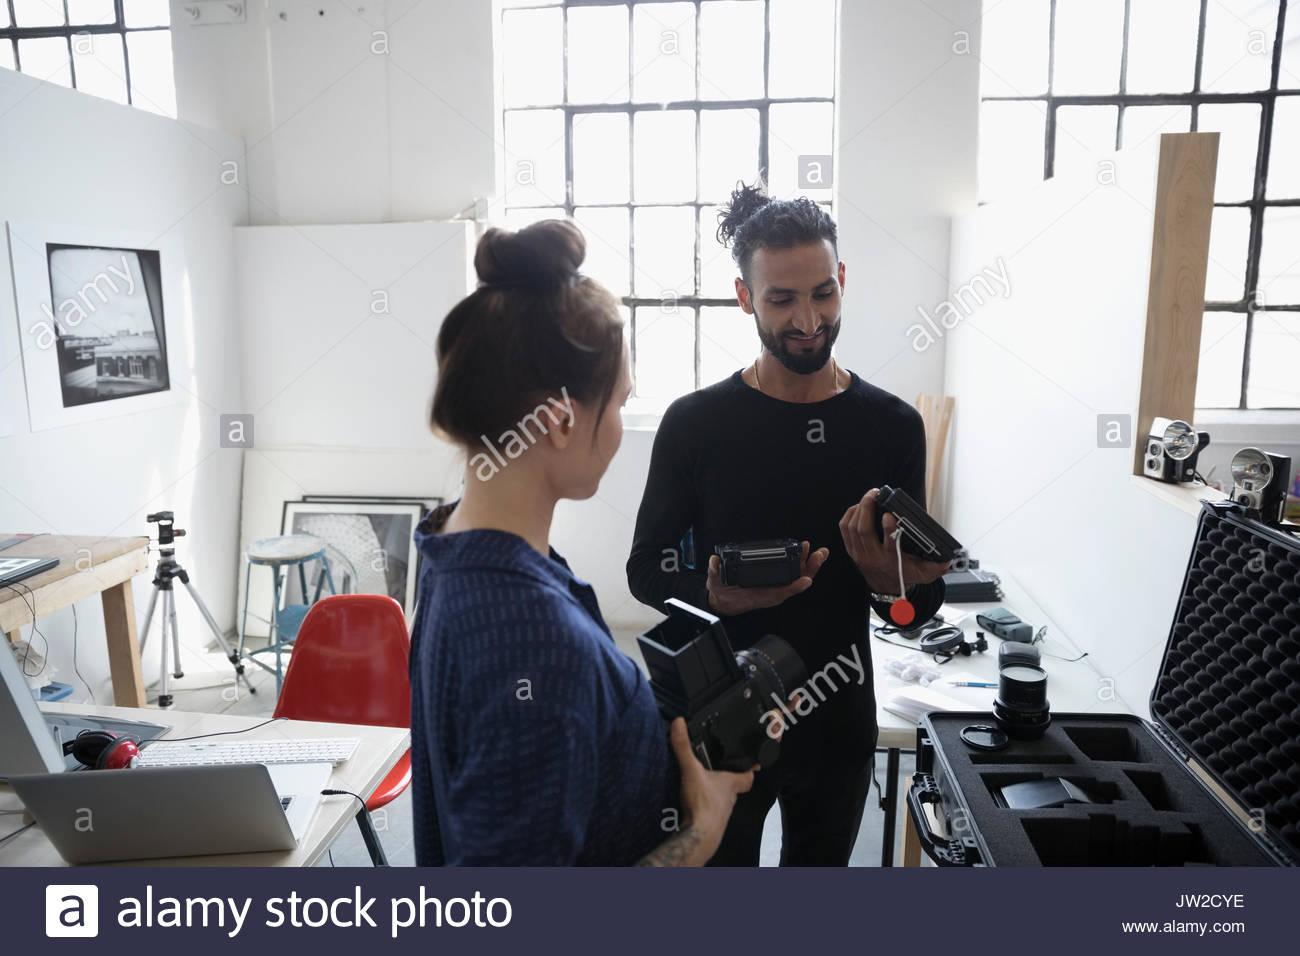 Photographers examining camera lens equipment in art studio - Stock Image